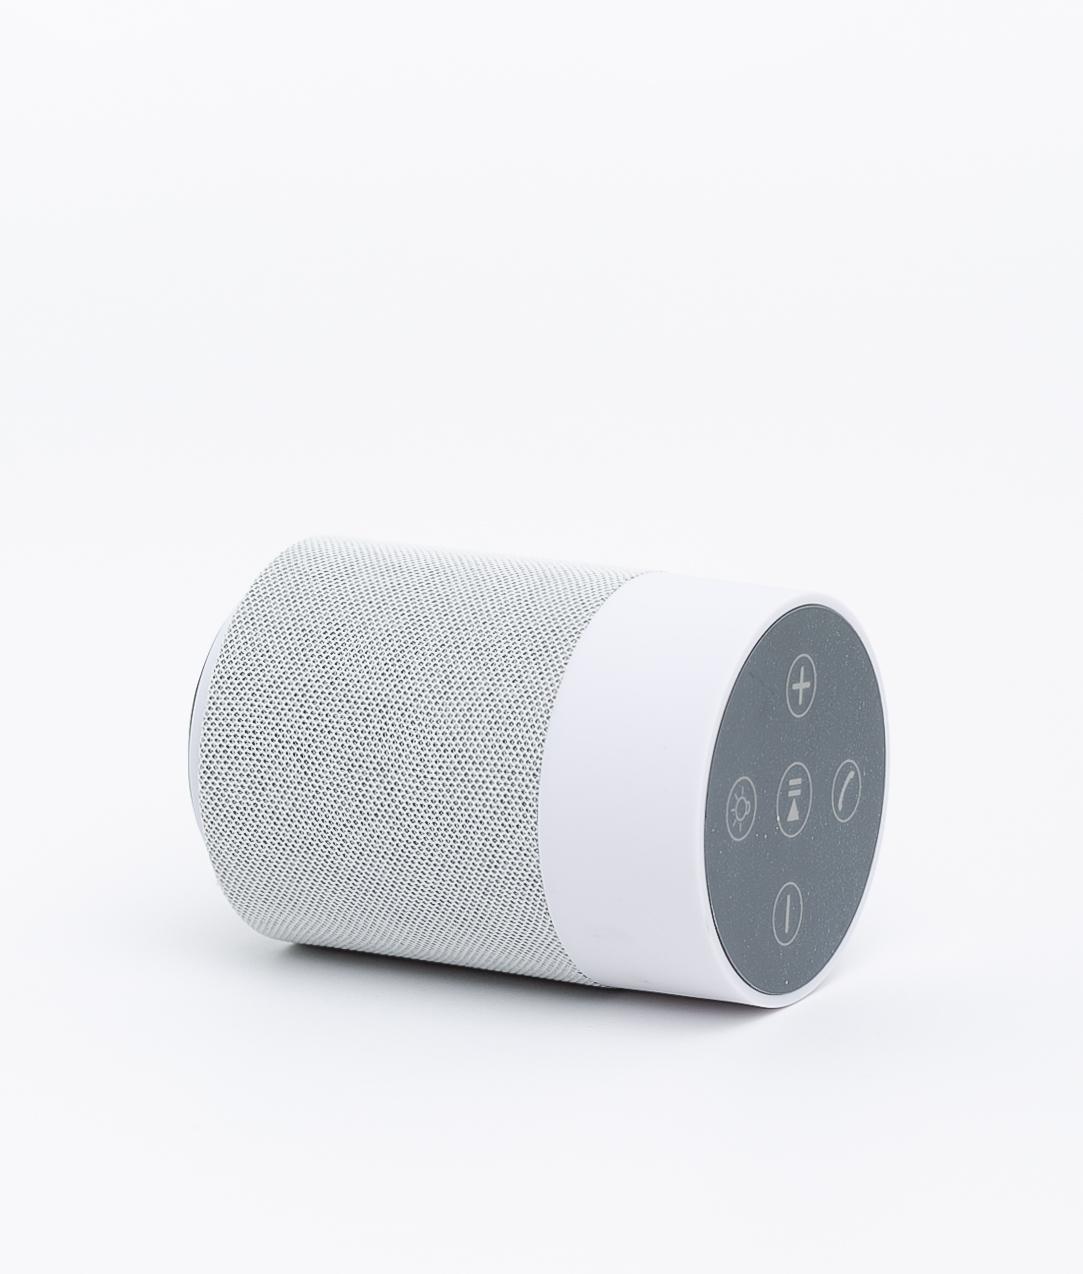 Abacus Bluetooth Speaker - Gray